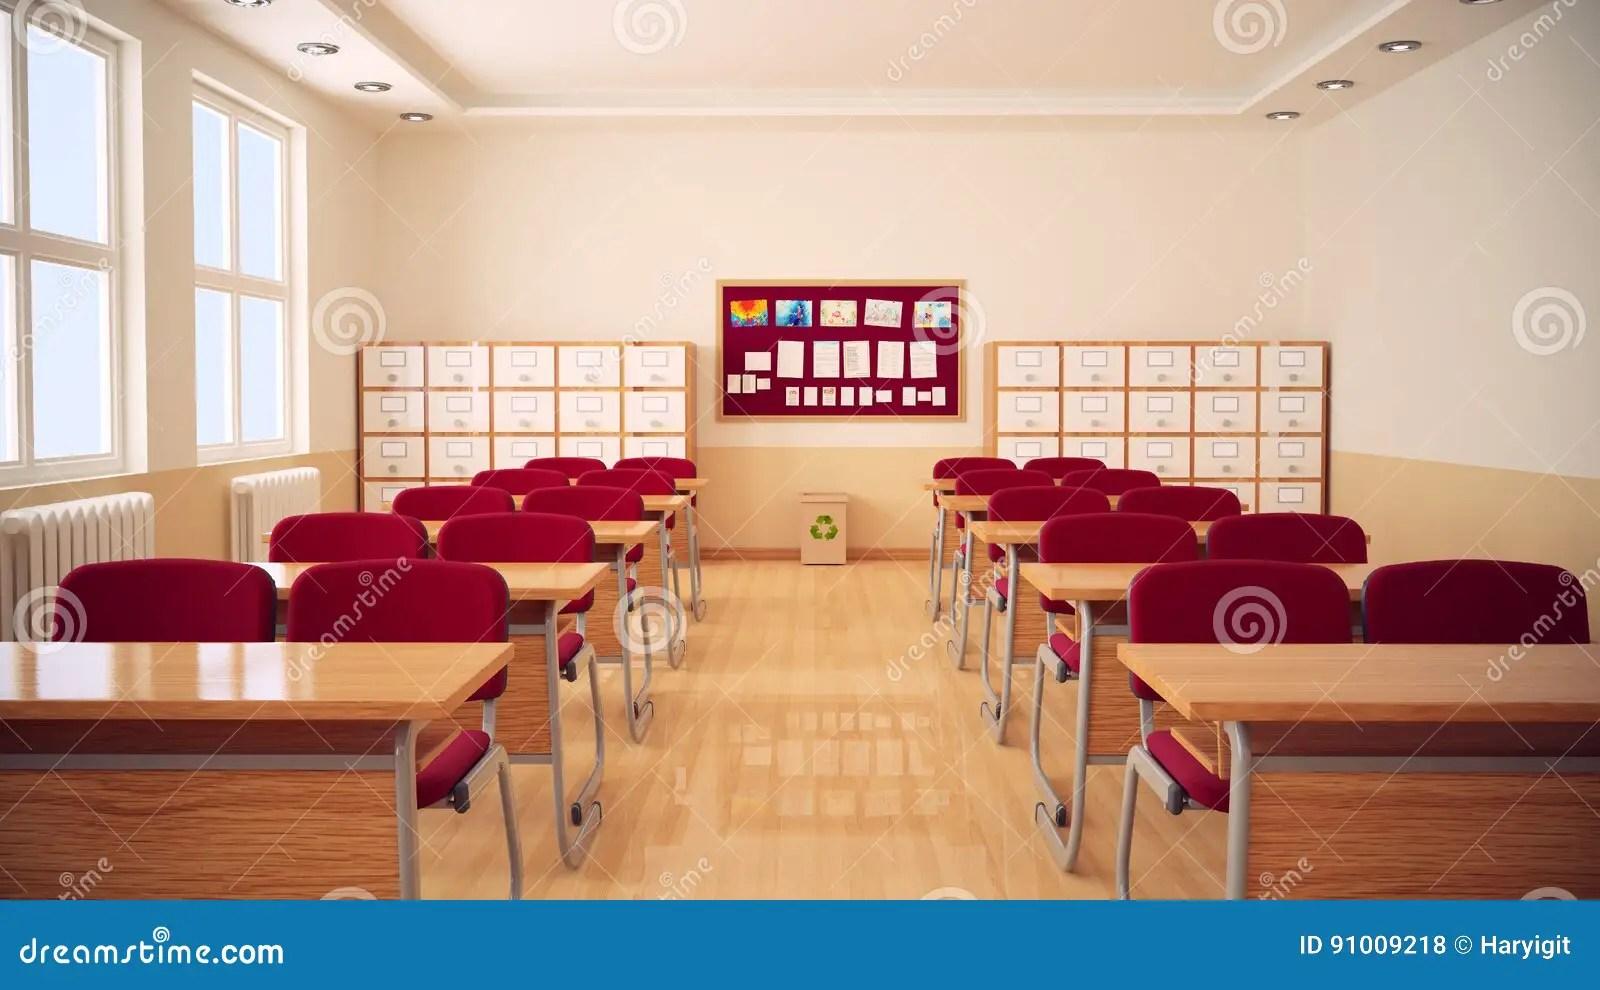 The Interior Of Classroom Stock Illustration